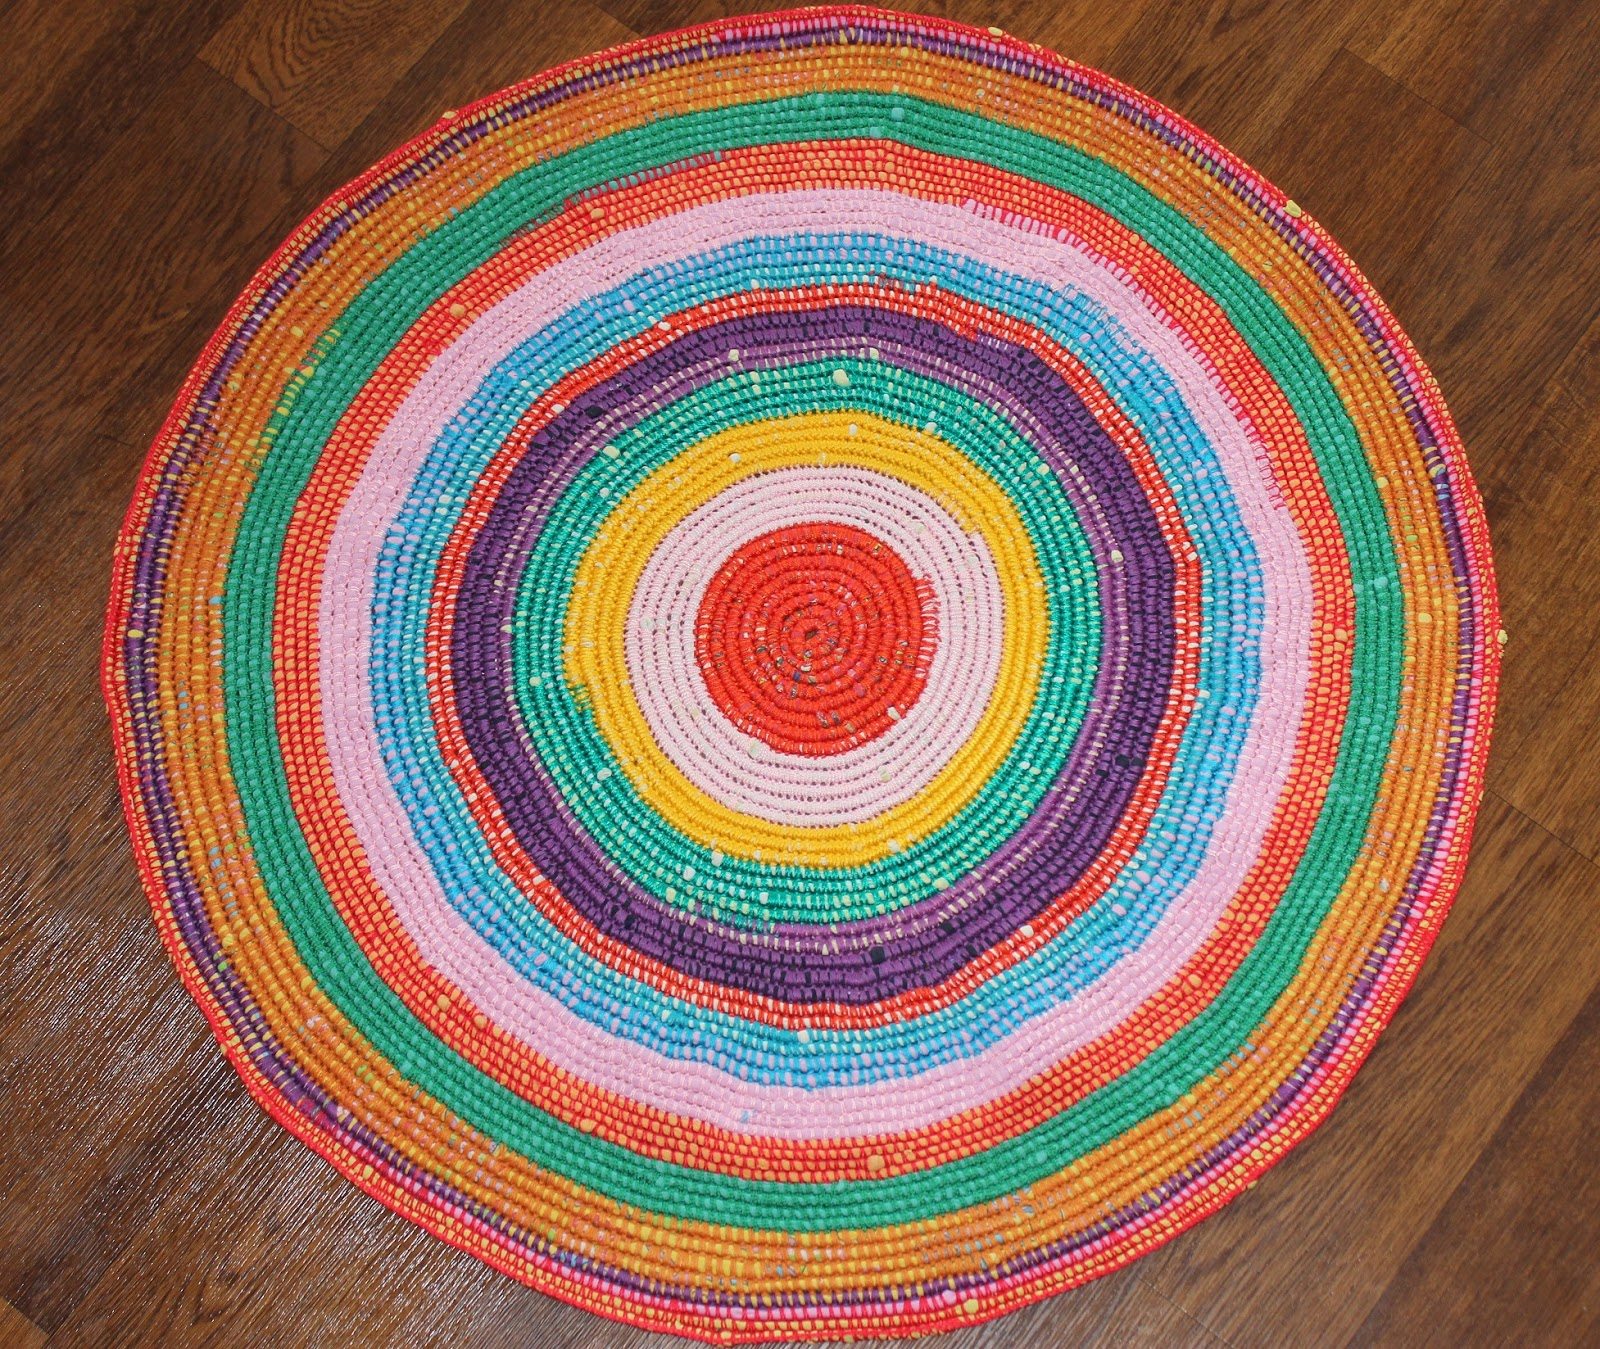 Вязание круглого половика крючком 91